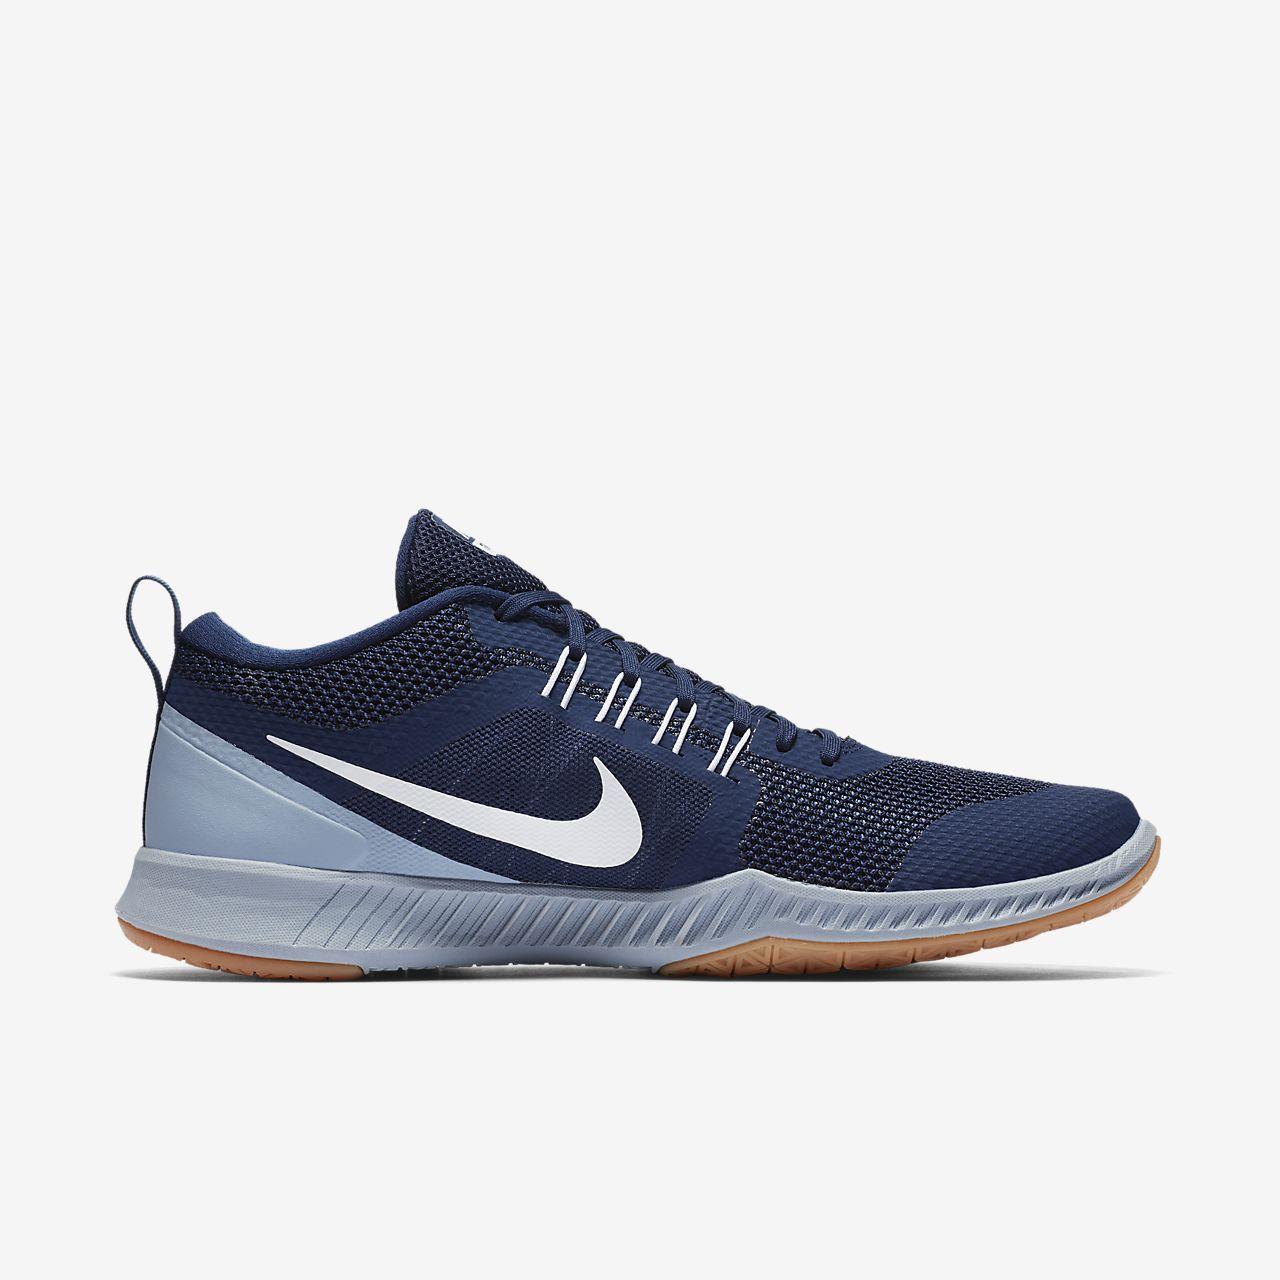 e4cf69828eca Nike Zoom Domination Men s Training Shoe. Nike.com AU